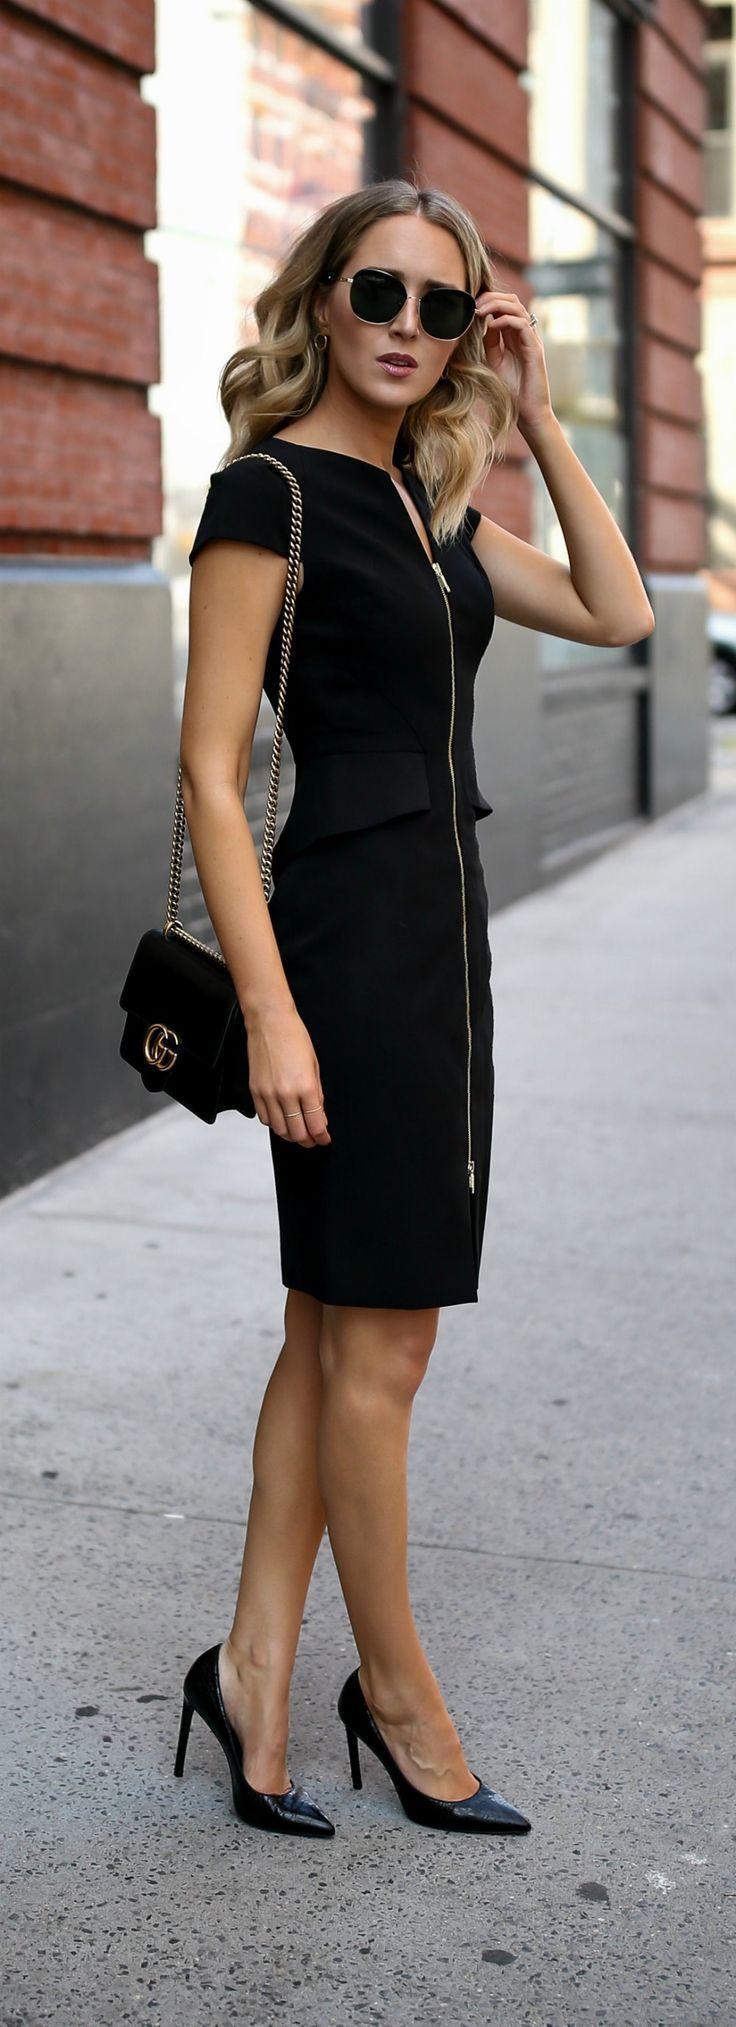 Classic Black Sheath // Black peplum front zip sheath dress, classic black pumps, oversized sunglasses {Ted Baker, Nordstrom, Saint Laurent, Gucci, workwear, wear to work style, office style}